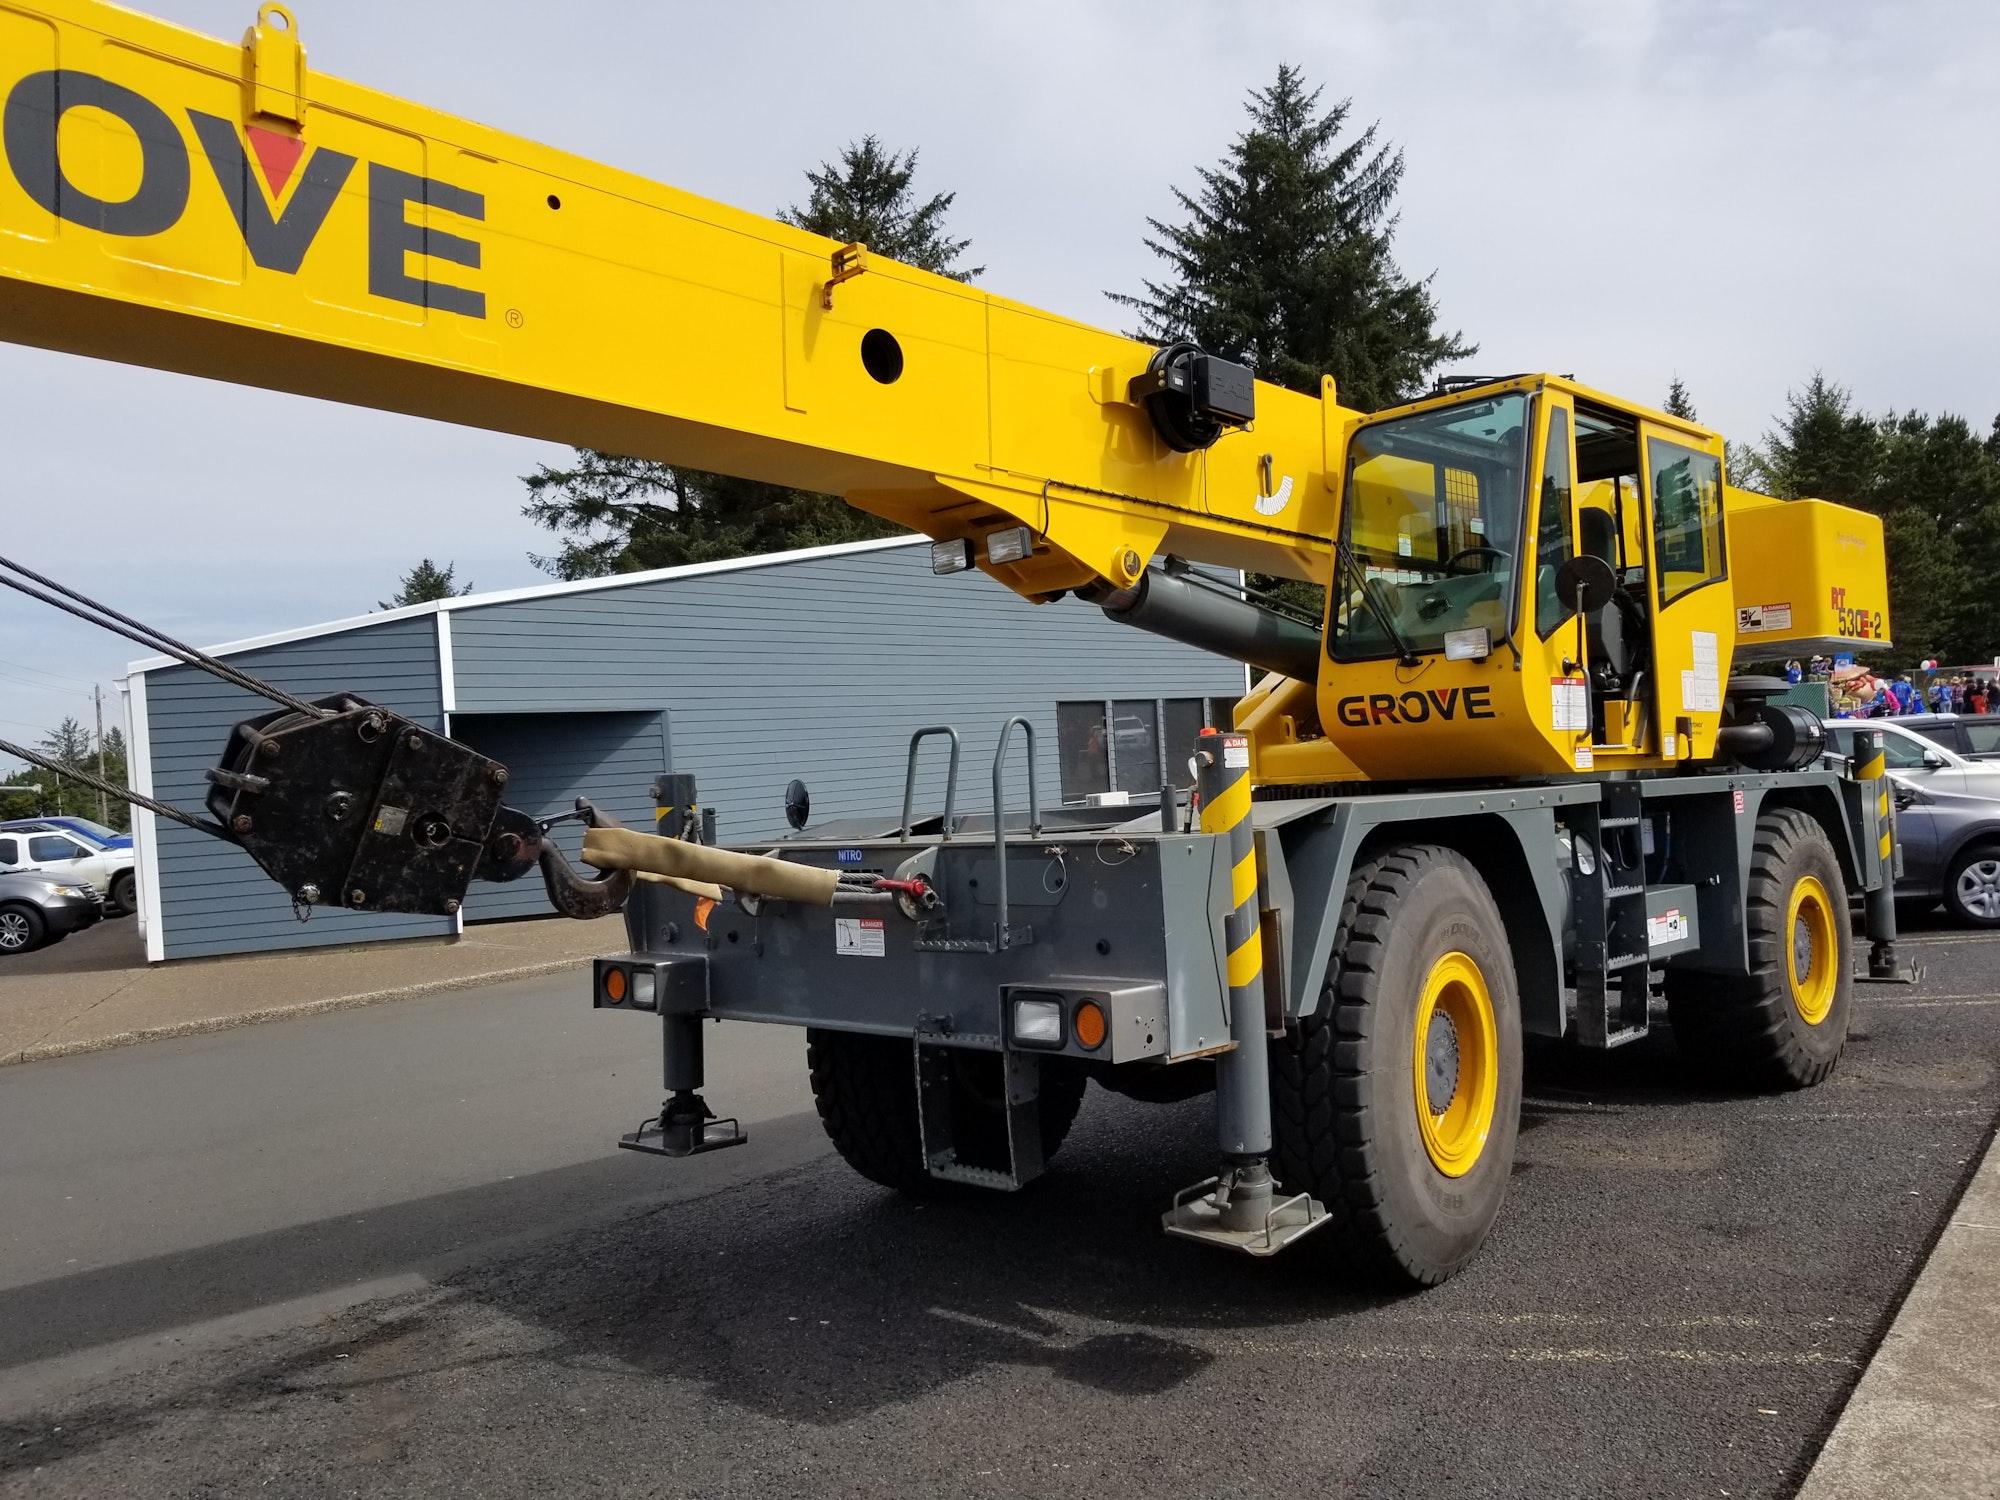 May contain: construction crane